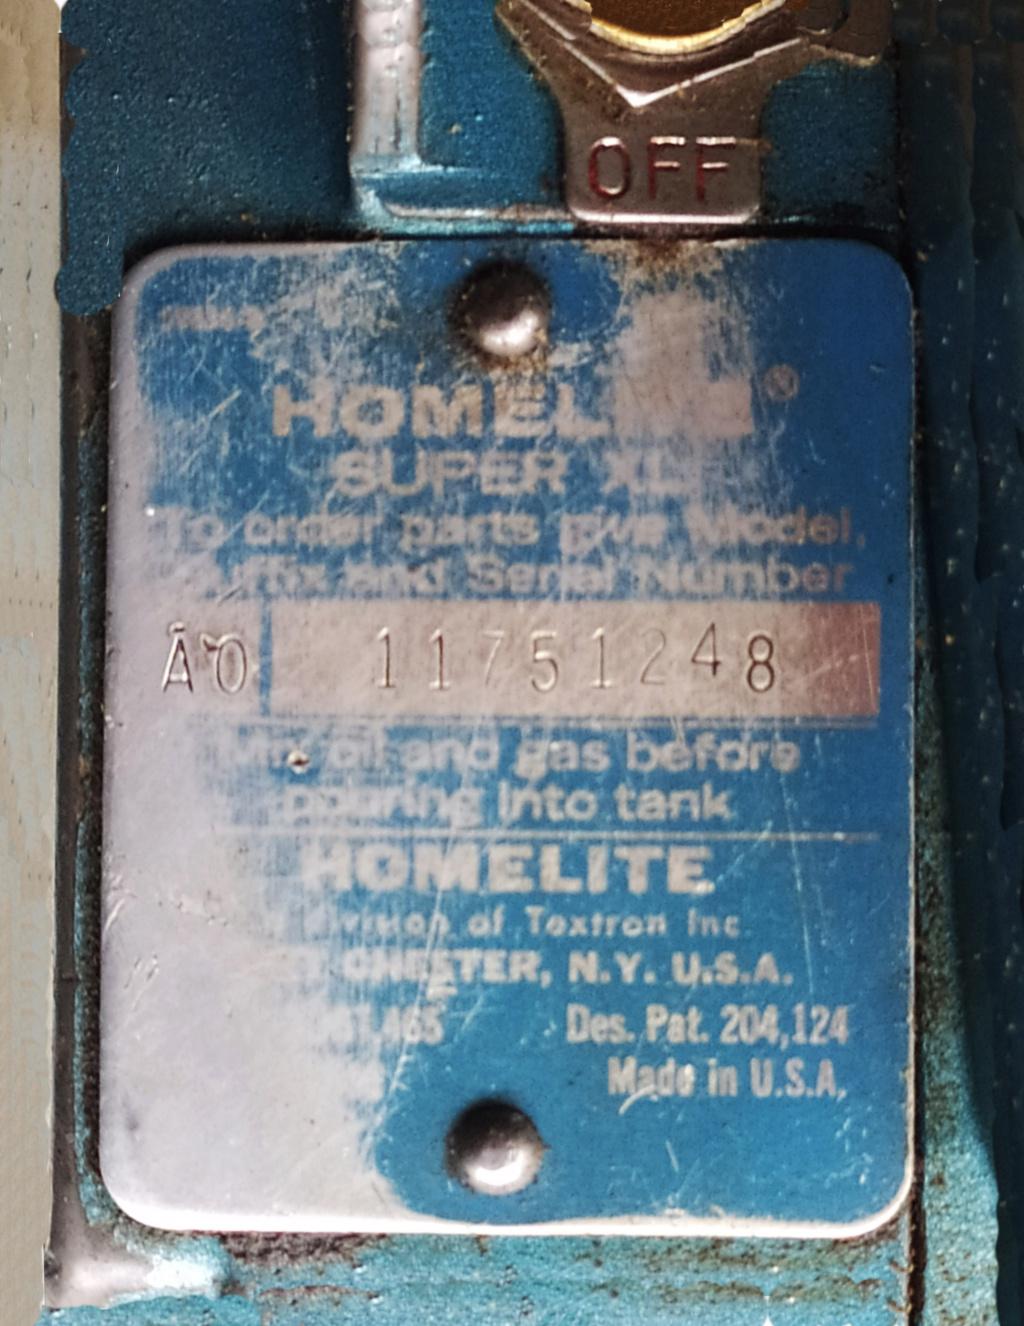 HOMELITE SUPER XL-AO Old Blue Img_2010